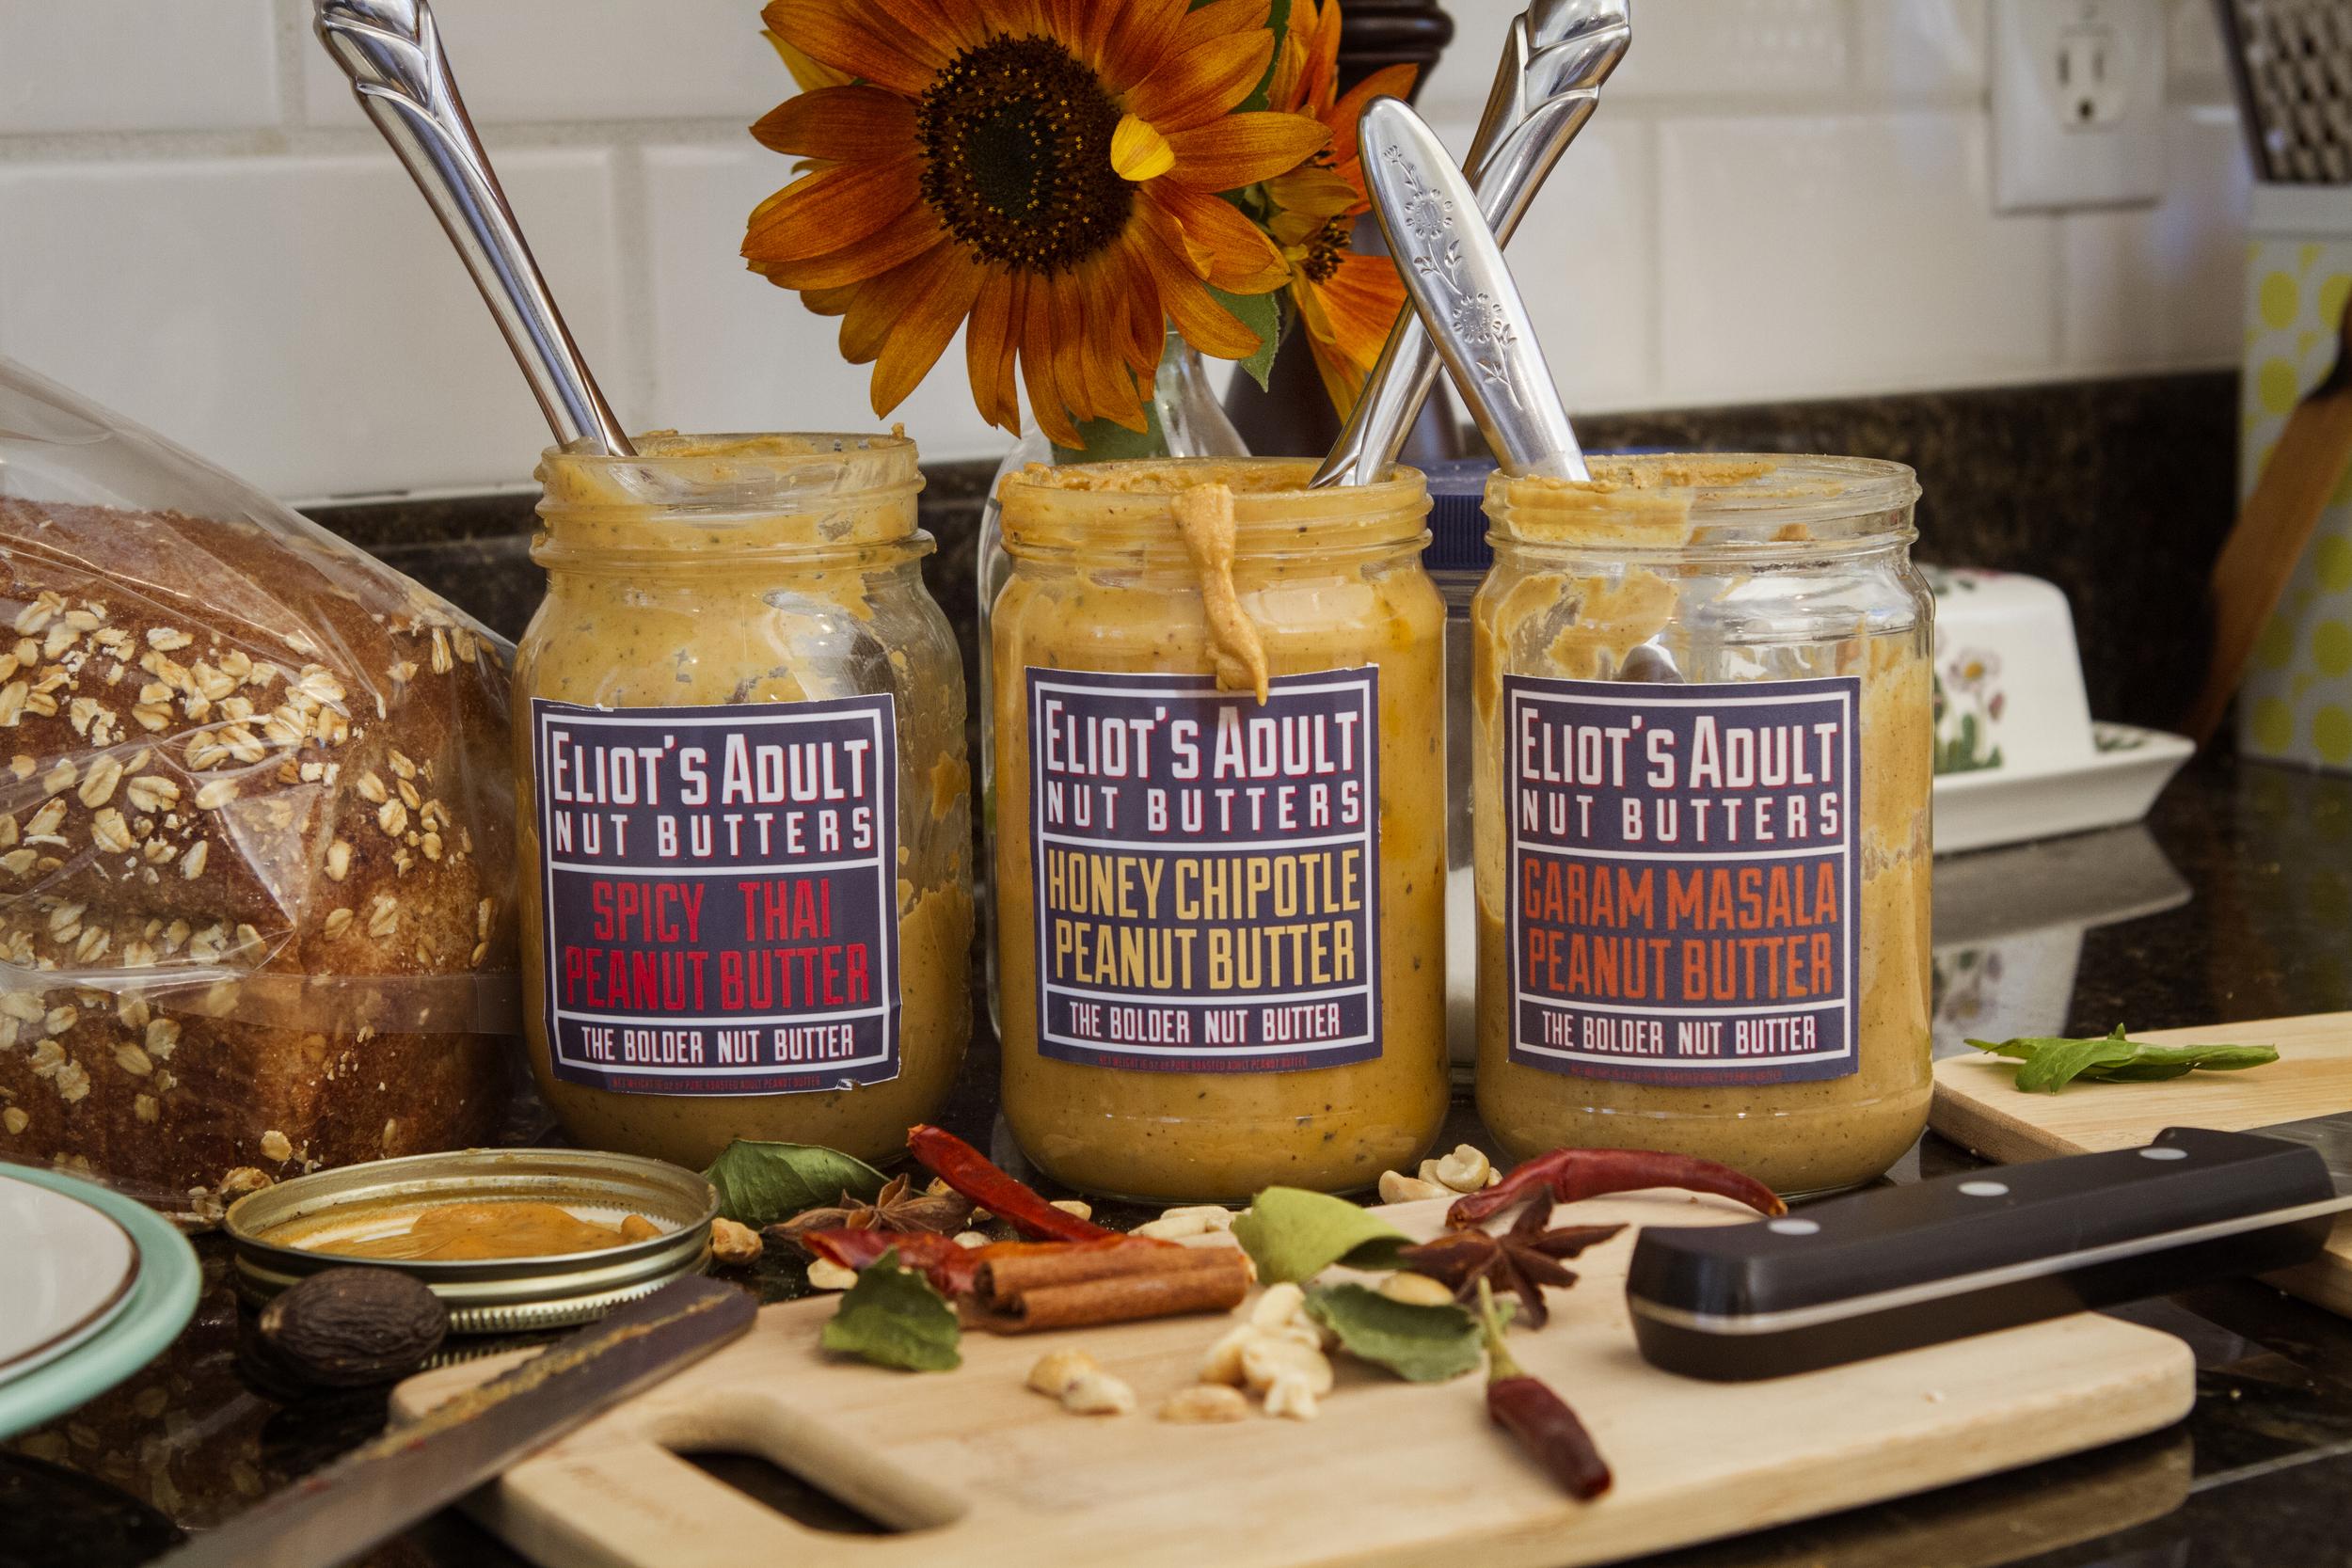 Eliot's Adult Nut Butters5.jpg